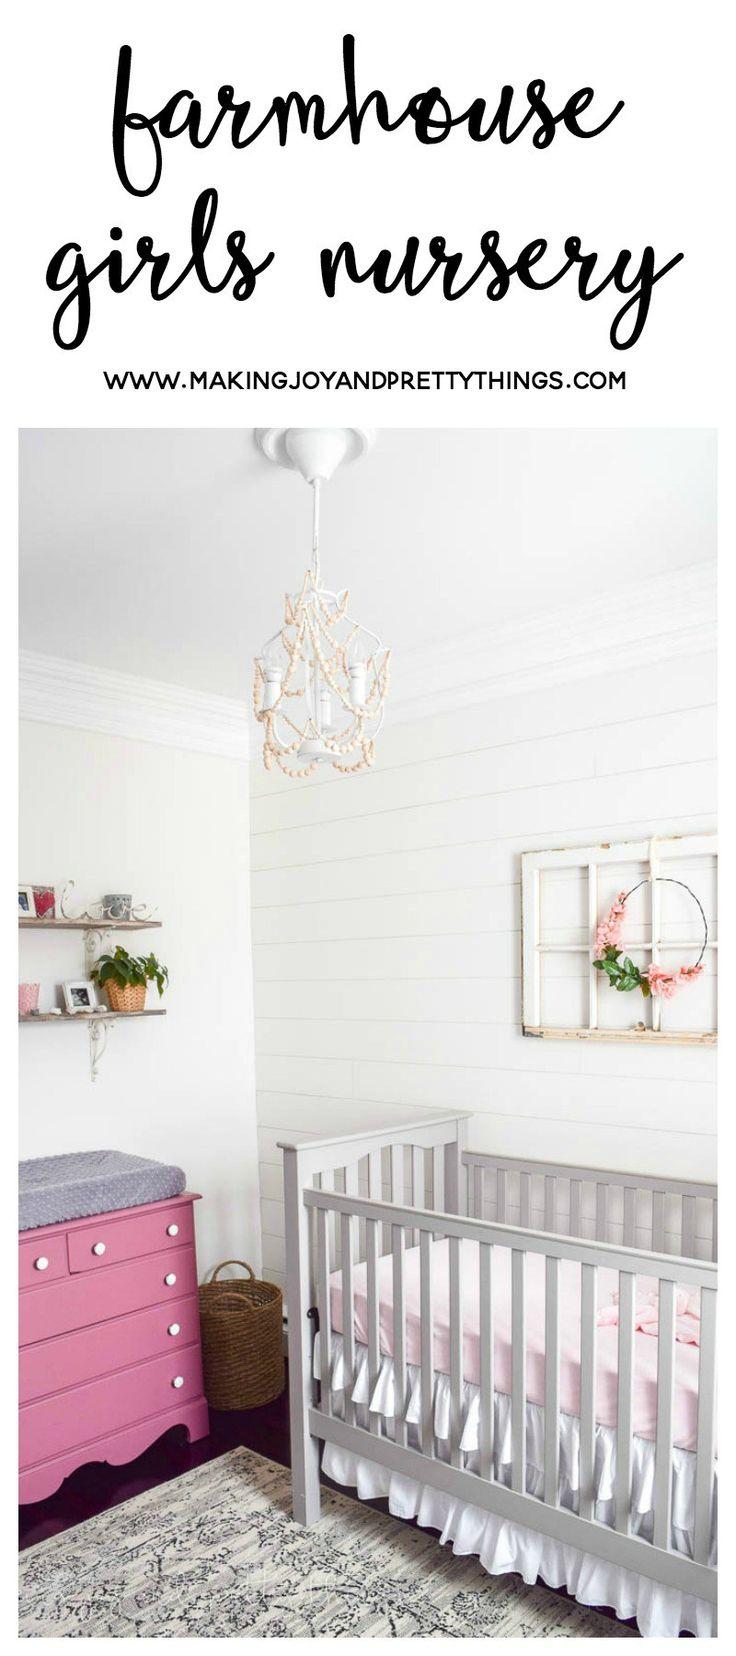 Owl crafts baby bedding nursery decor nursery crafts forward pink owl - Farmhouse Girls Nursery Reveal